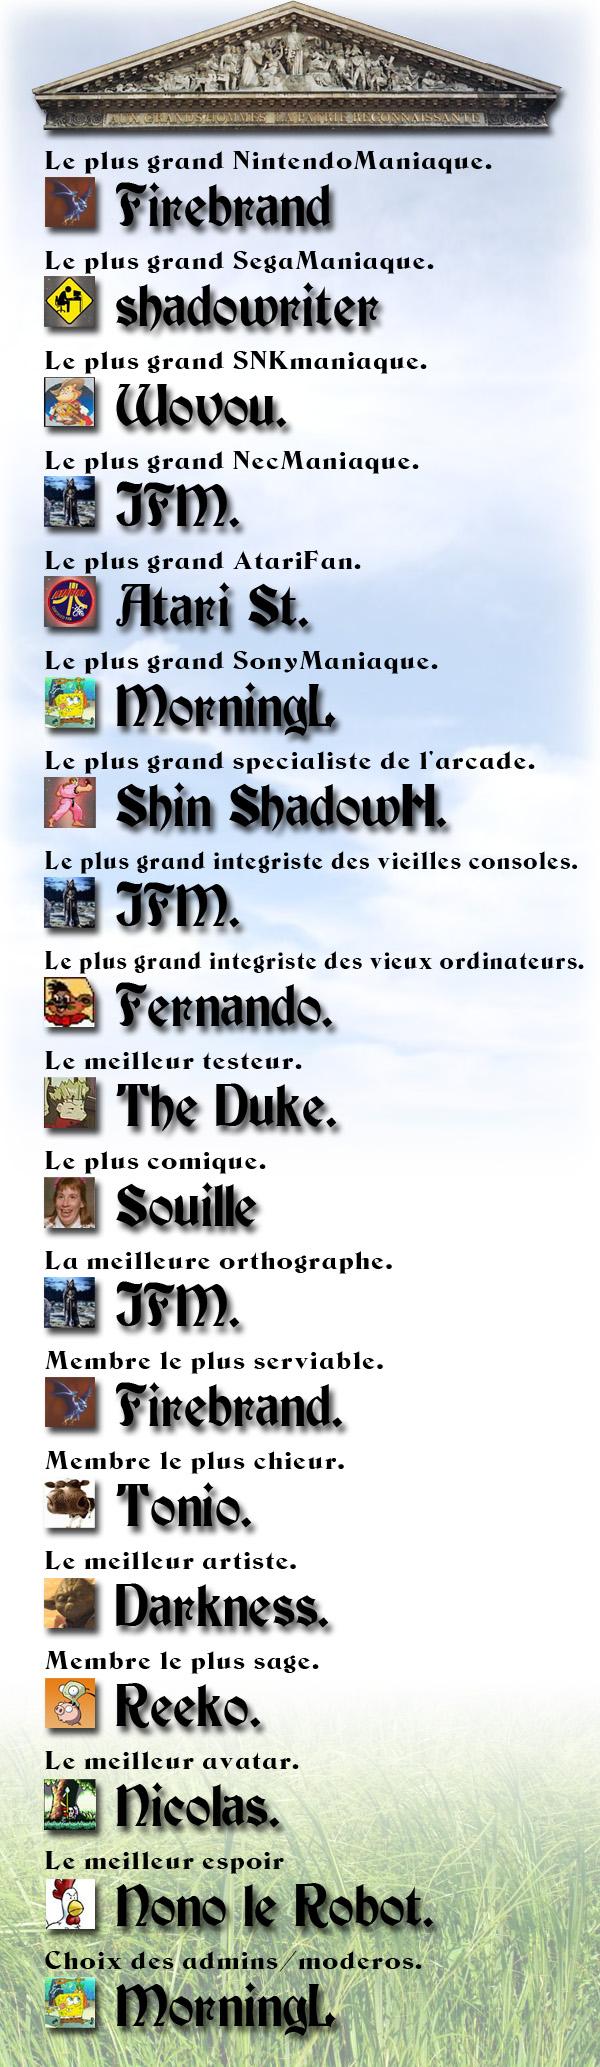 http://www.planetemu.net/php/articles/files/Image/zapier/planetars/p2004.jpg